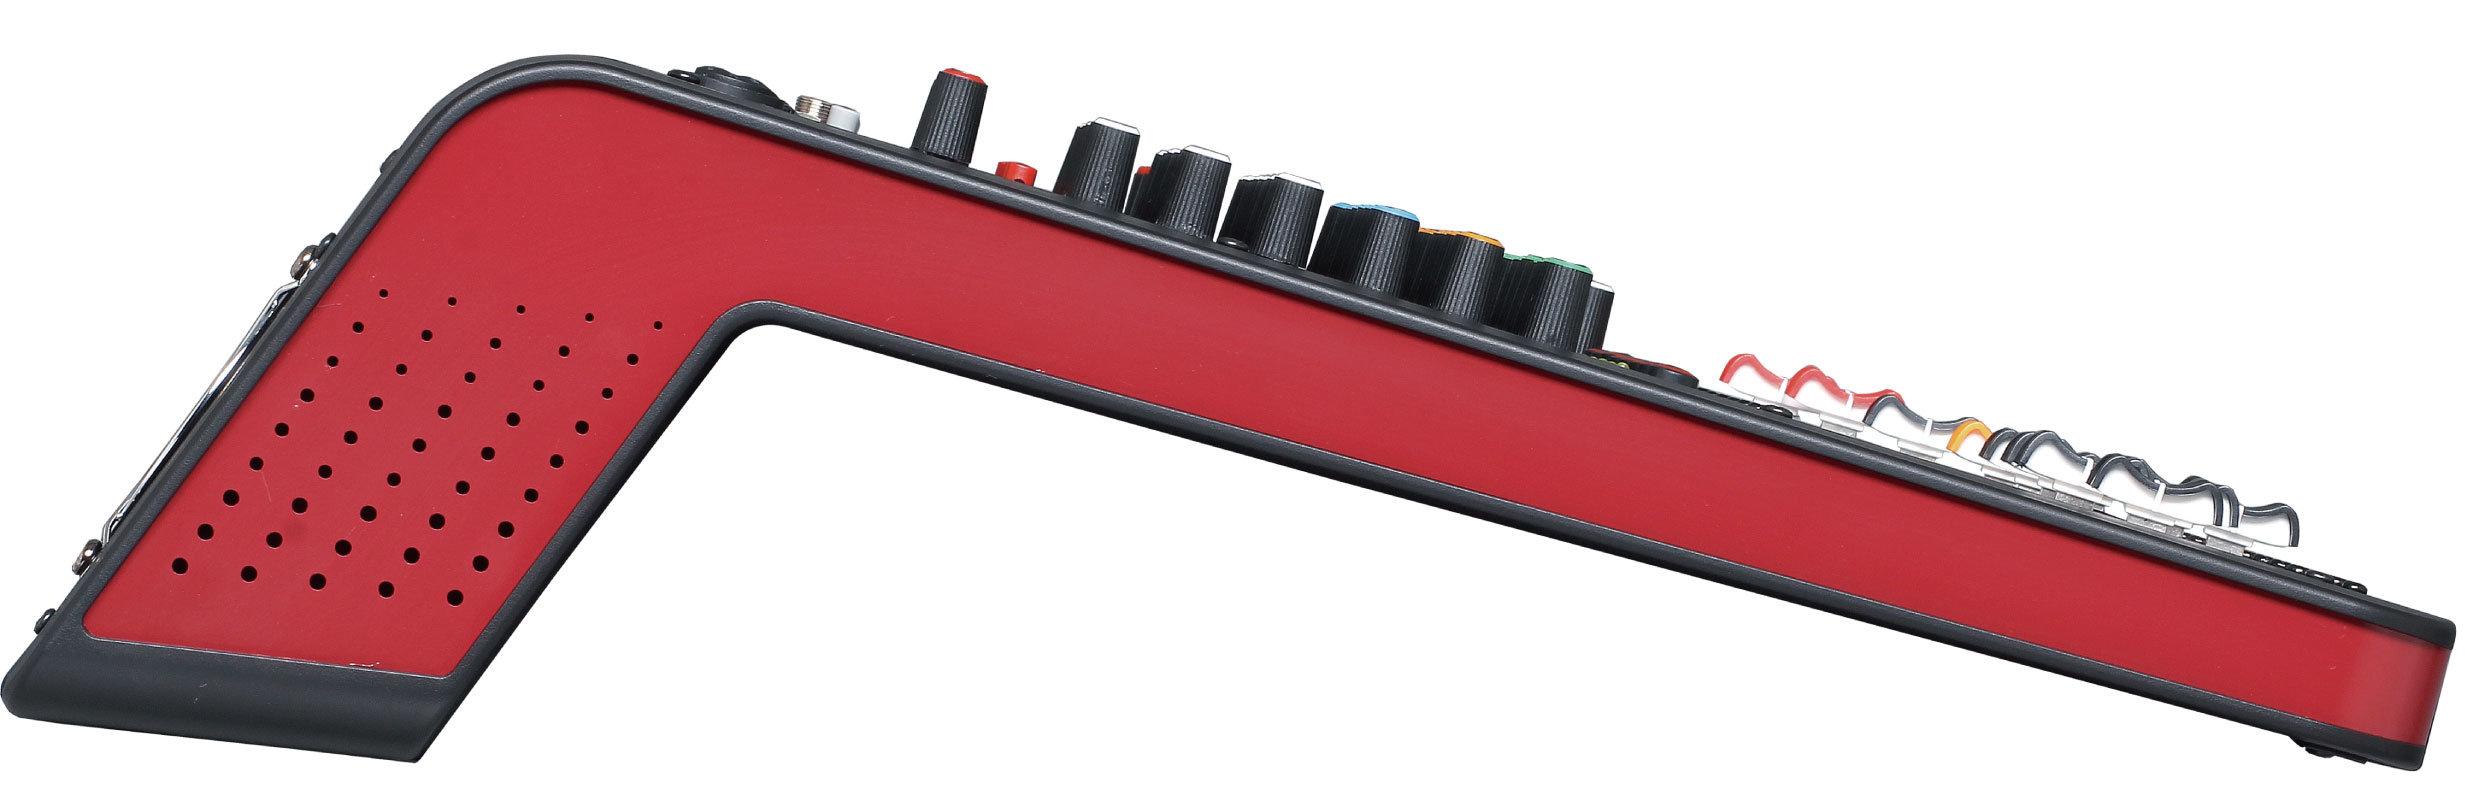 Special New Design Mixer Js Series Professional Amplifier